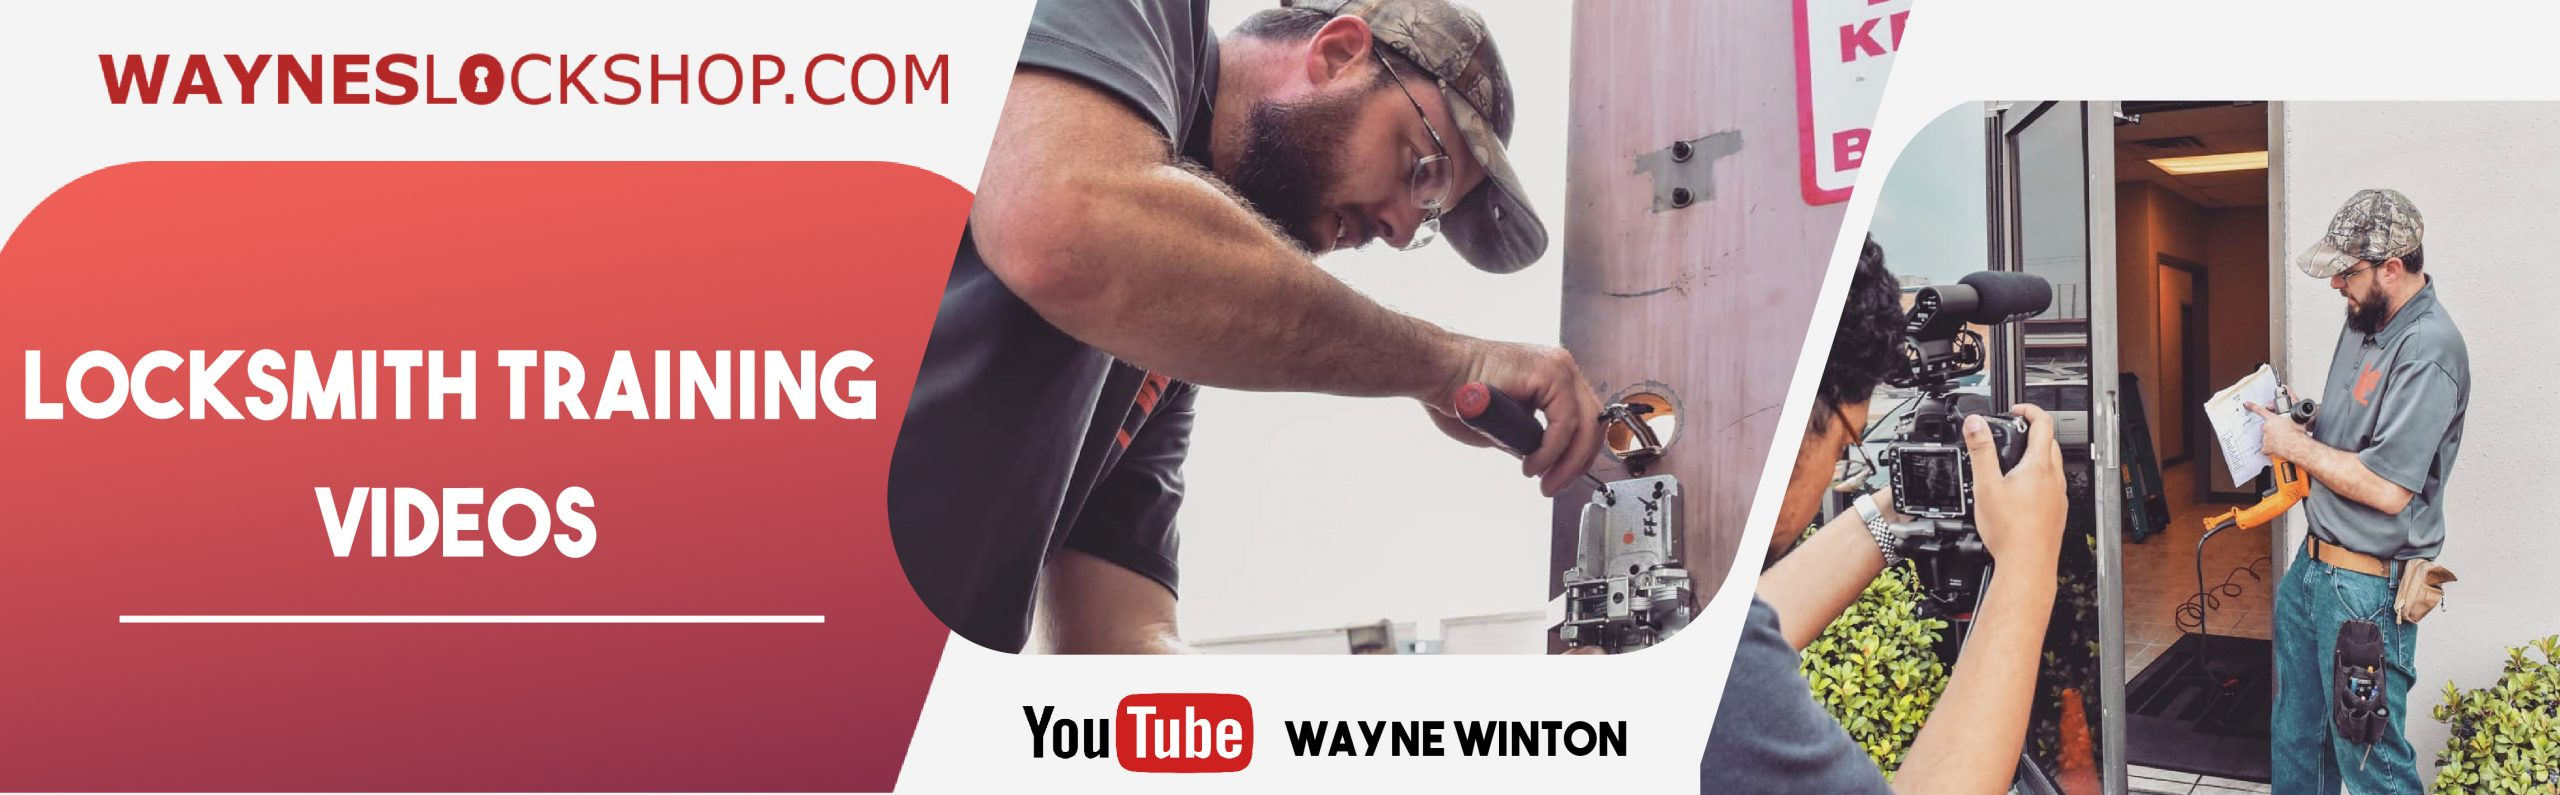 Locksmith Training Video Website